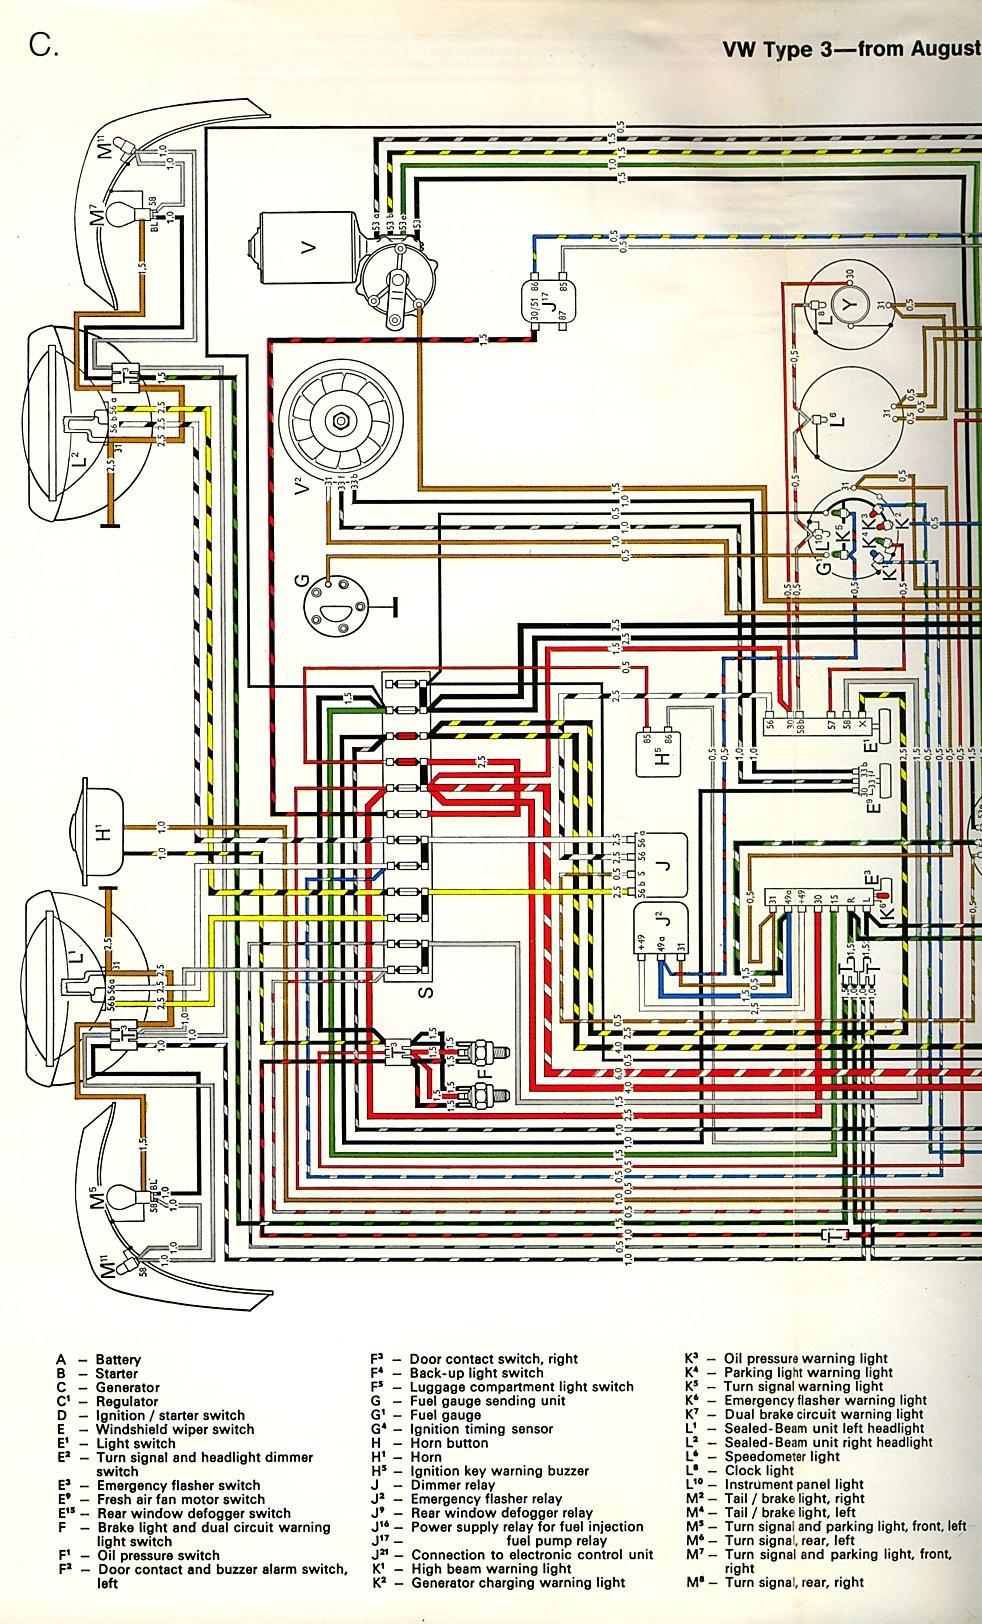 W115 Wiring Diagram W115 Get Free Image About Wiring Diagram